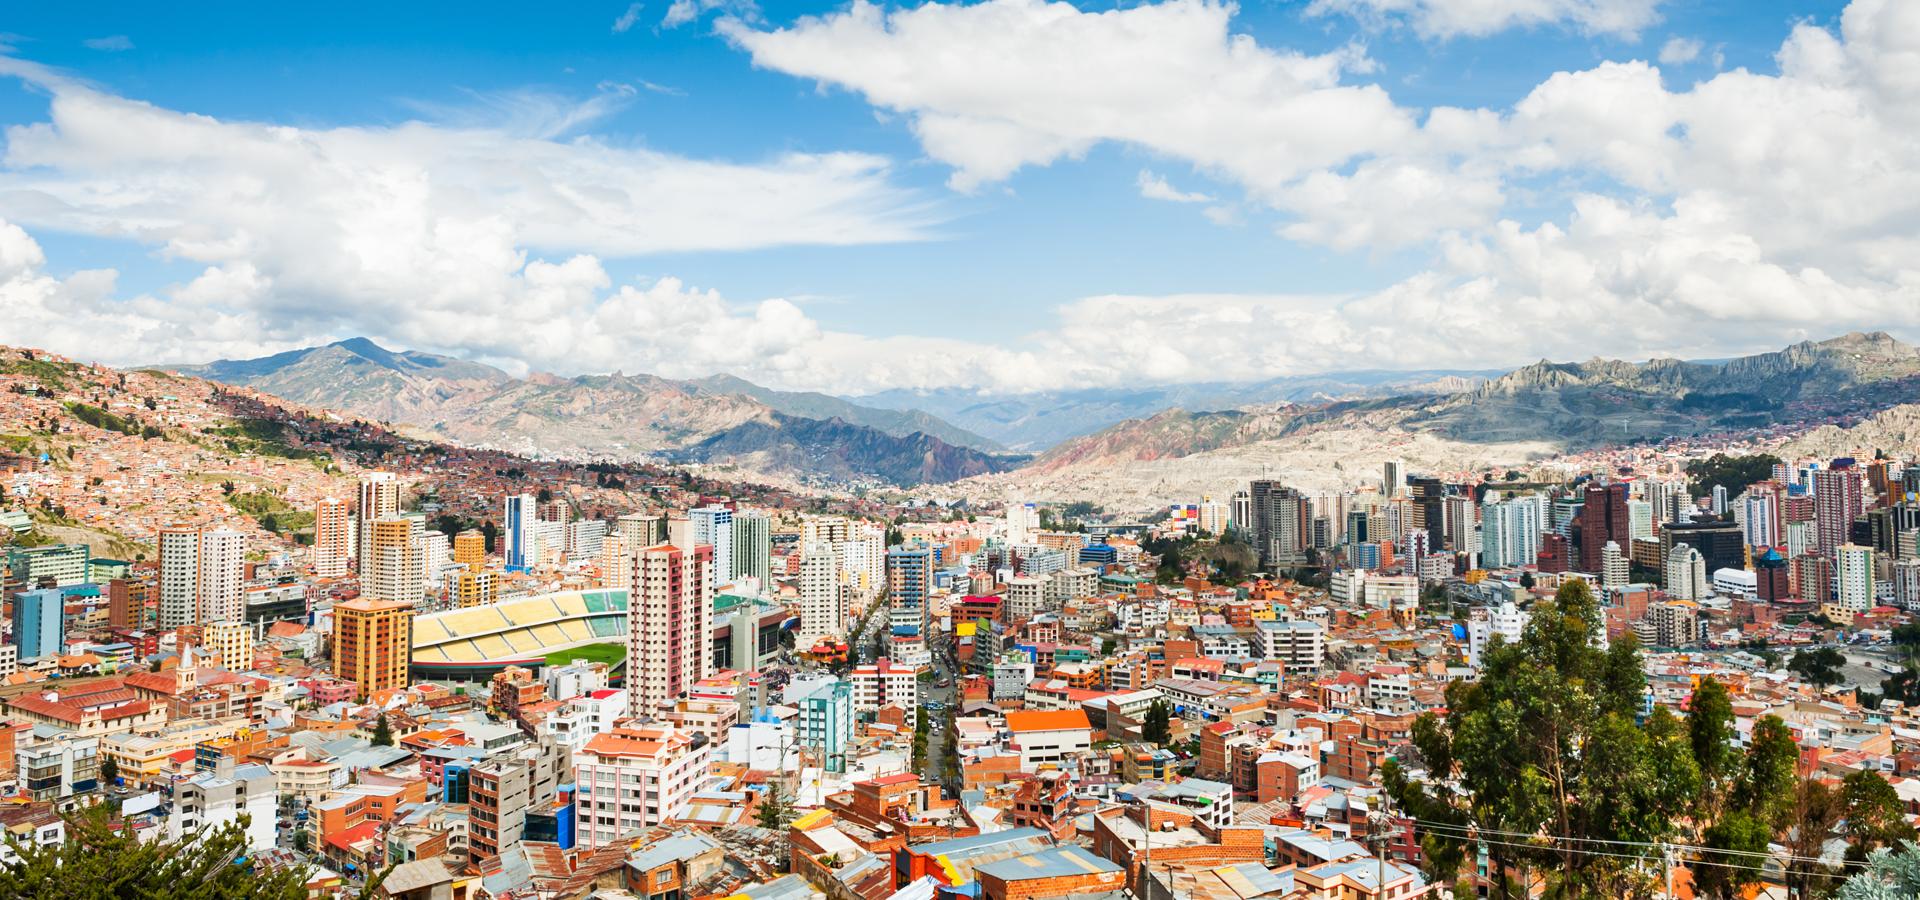 Peer-to-peer advisory in La Paz, Bolivia